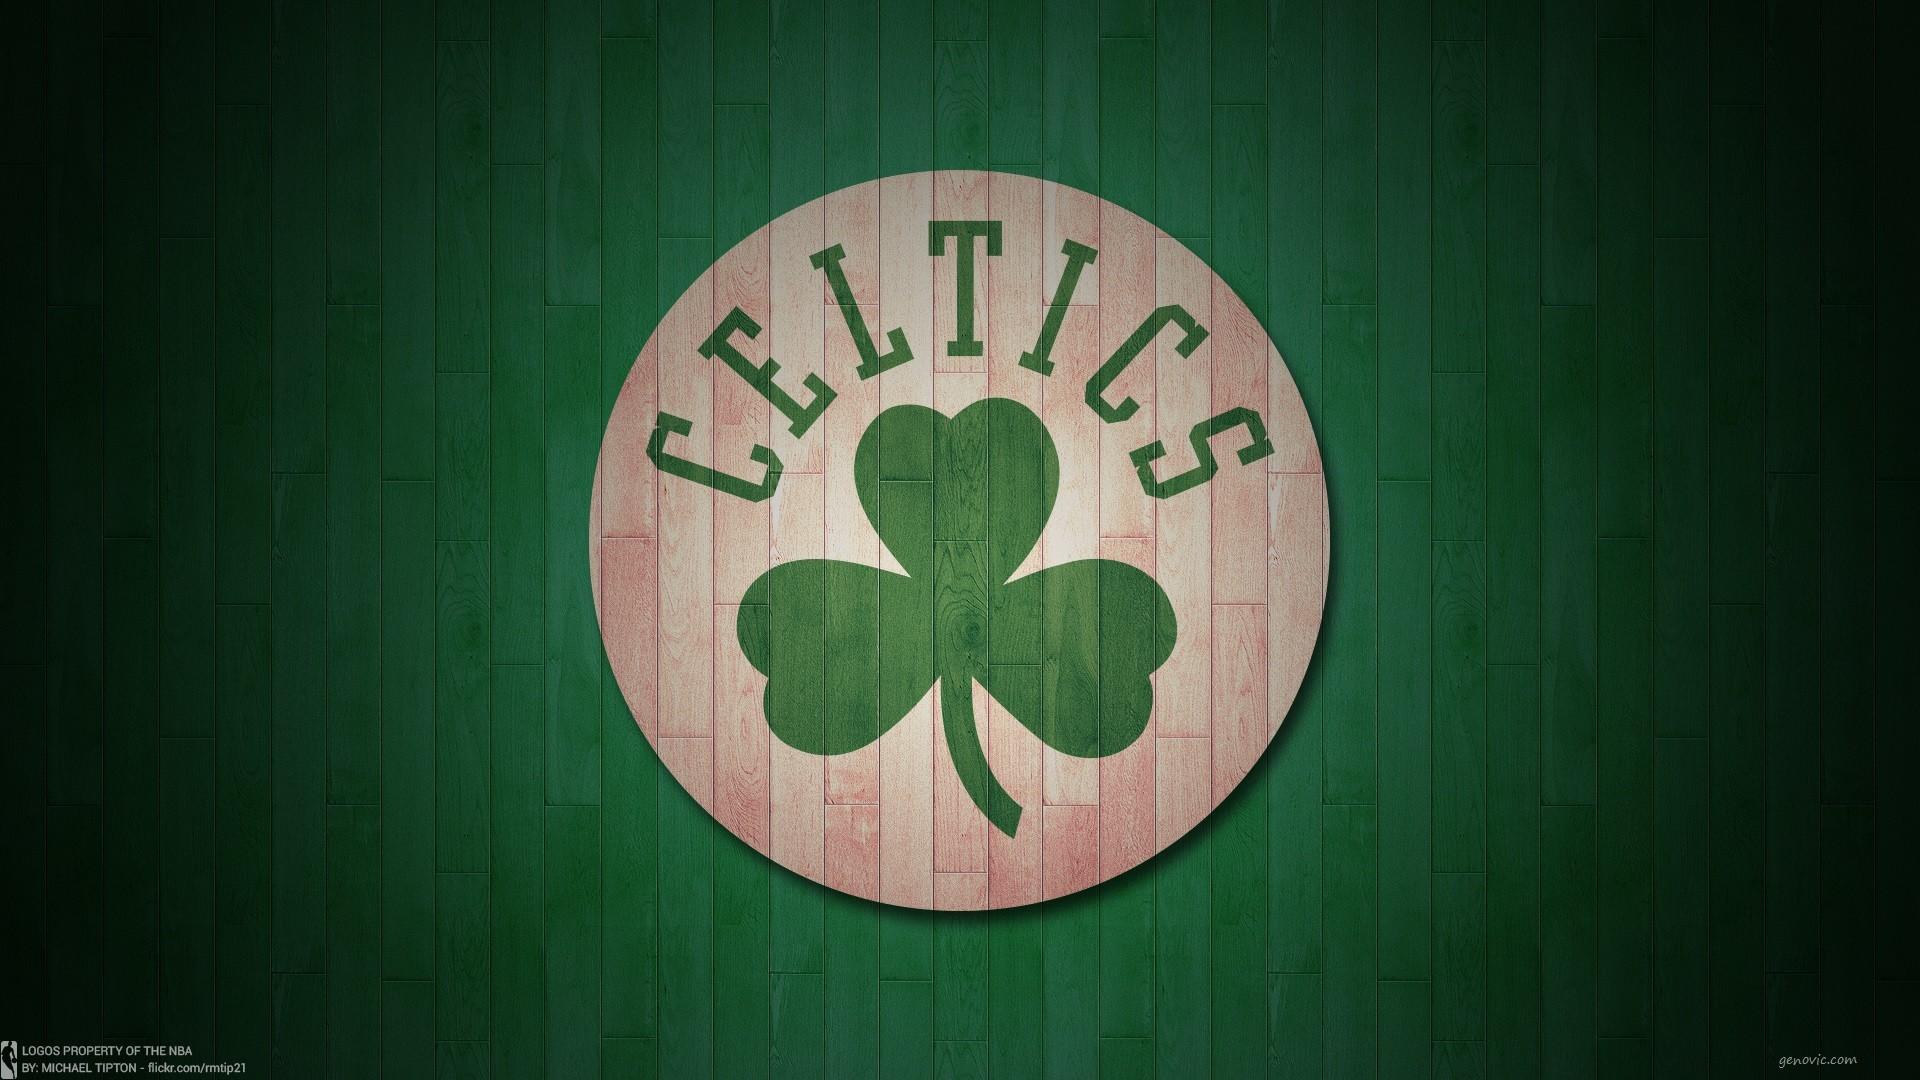 Boston Celtics Wallpapers 1000×700 Boston Celtics Wallpaper (47 Wallpapers)    Adorable Wallpapers   Desktop   Pinterest   Wallpaper and Wallpaper art